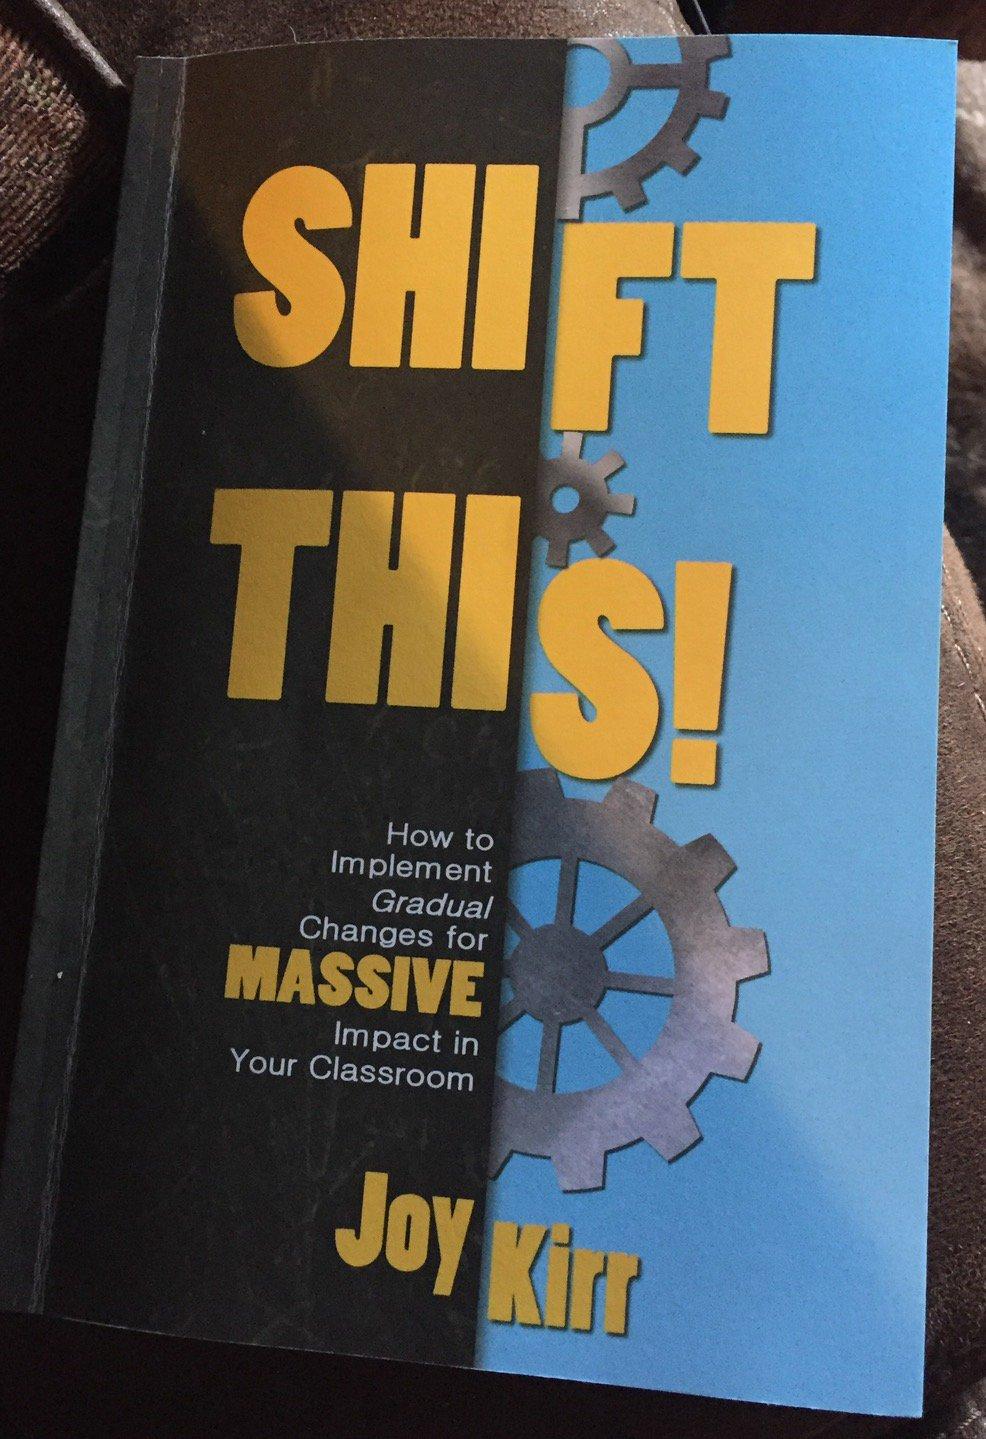 Countdown, 30 minutes! #shiftthis #LDISDchats #gearup https://t.co/v6JoQ7In5e